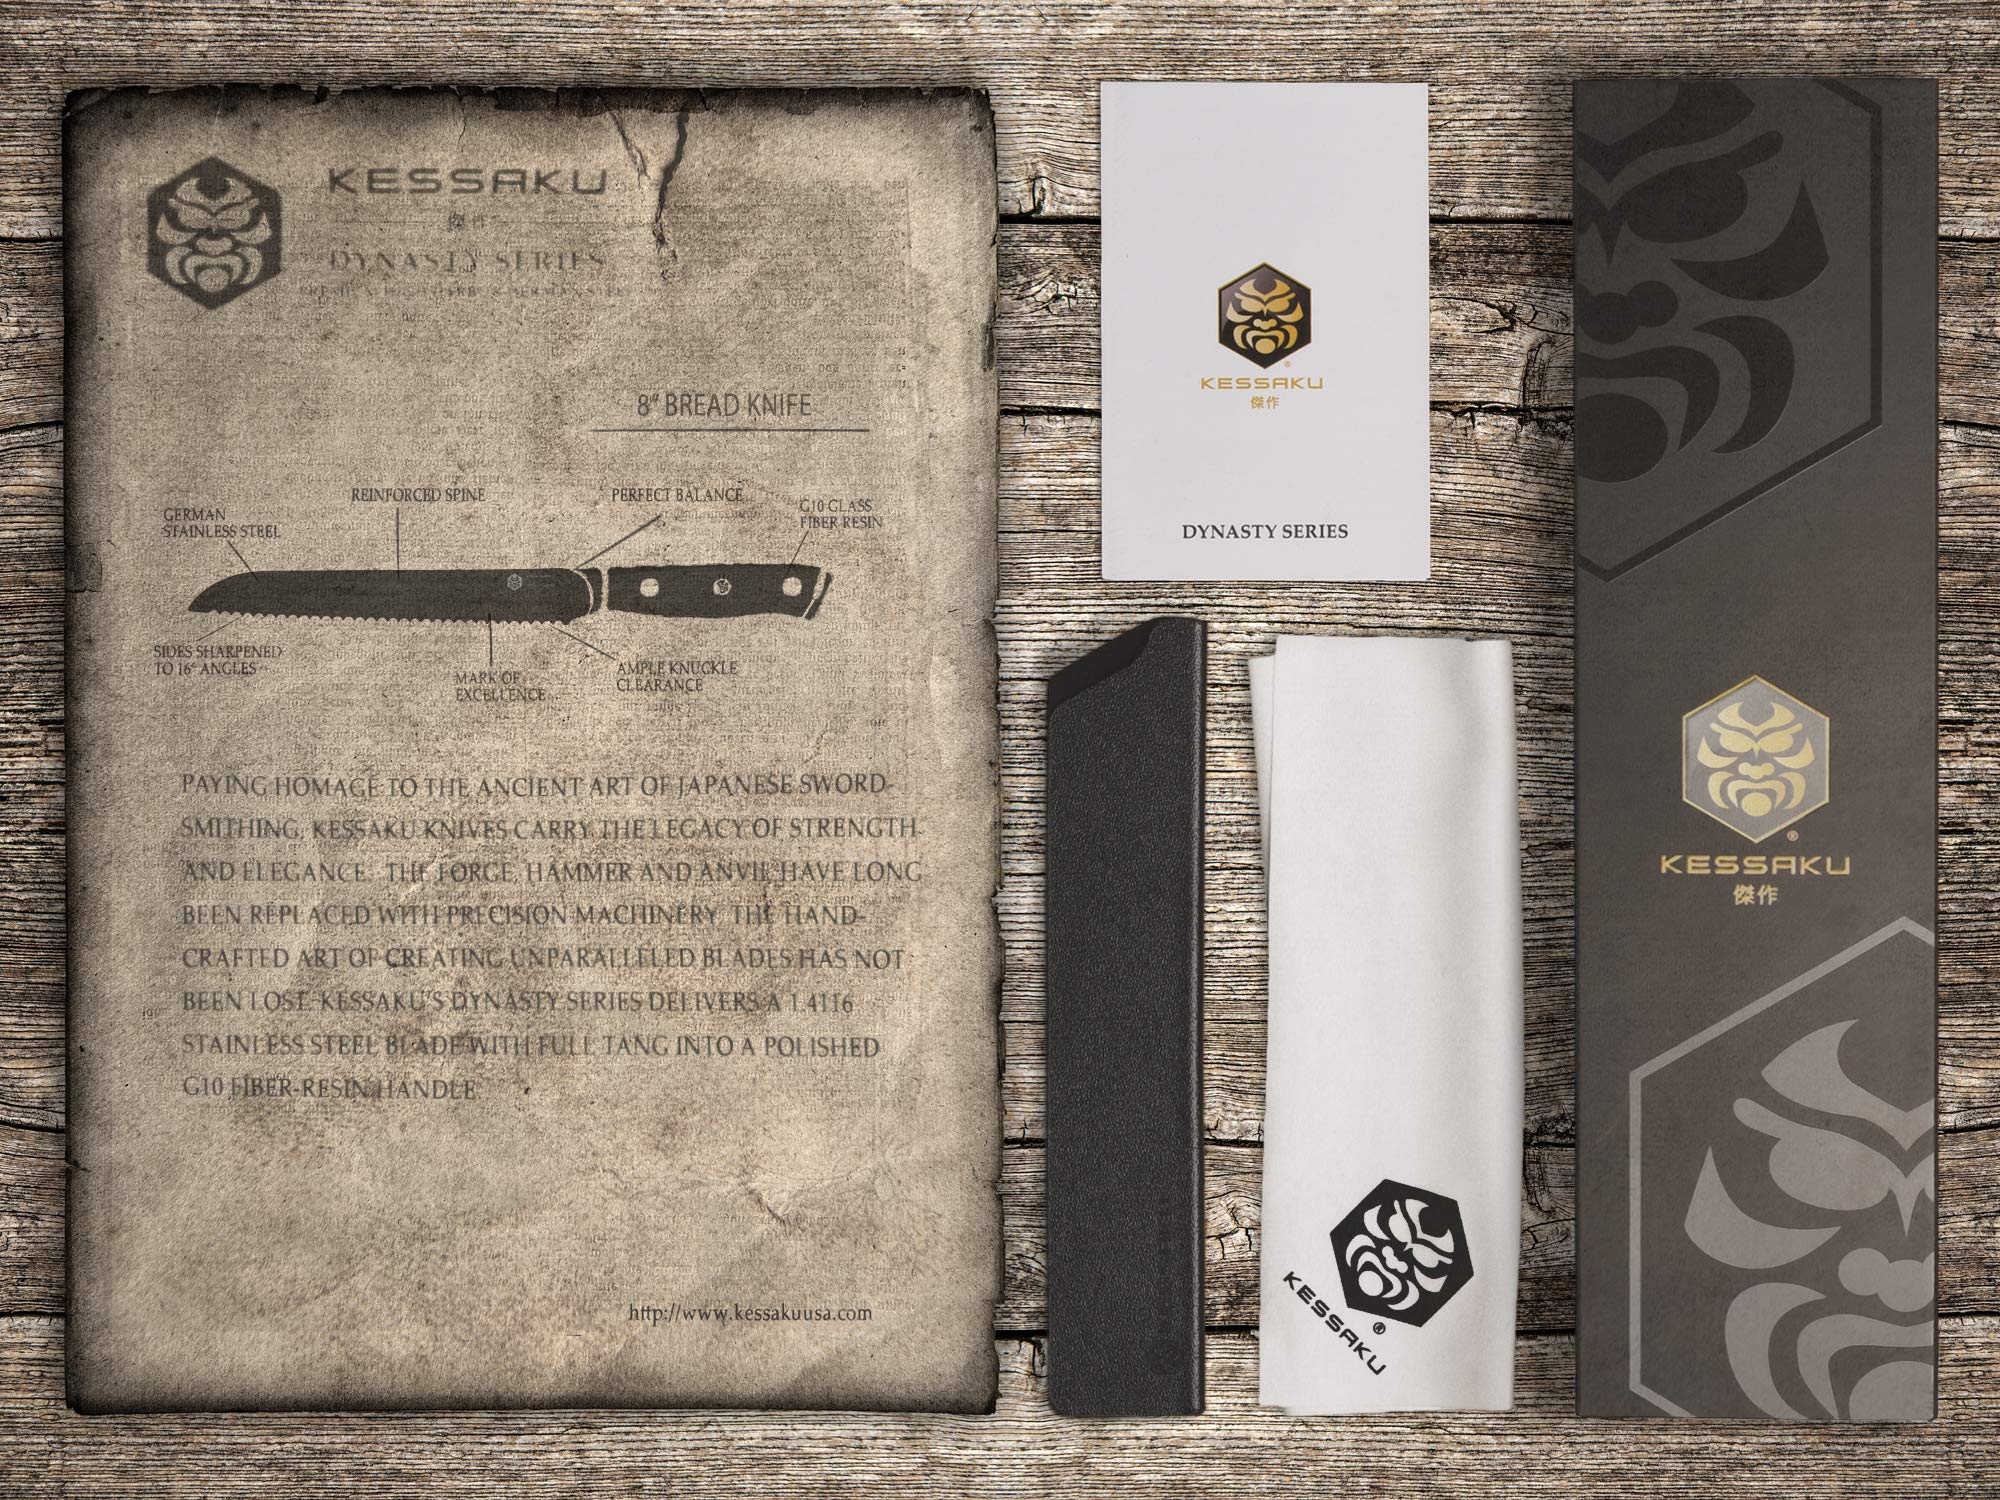 Kessaku Bread Knife - Dynasty Series - German HC Steel, G10 Full Tang Handle, 8-Inch by Kessaku (Image #5)